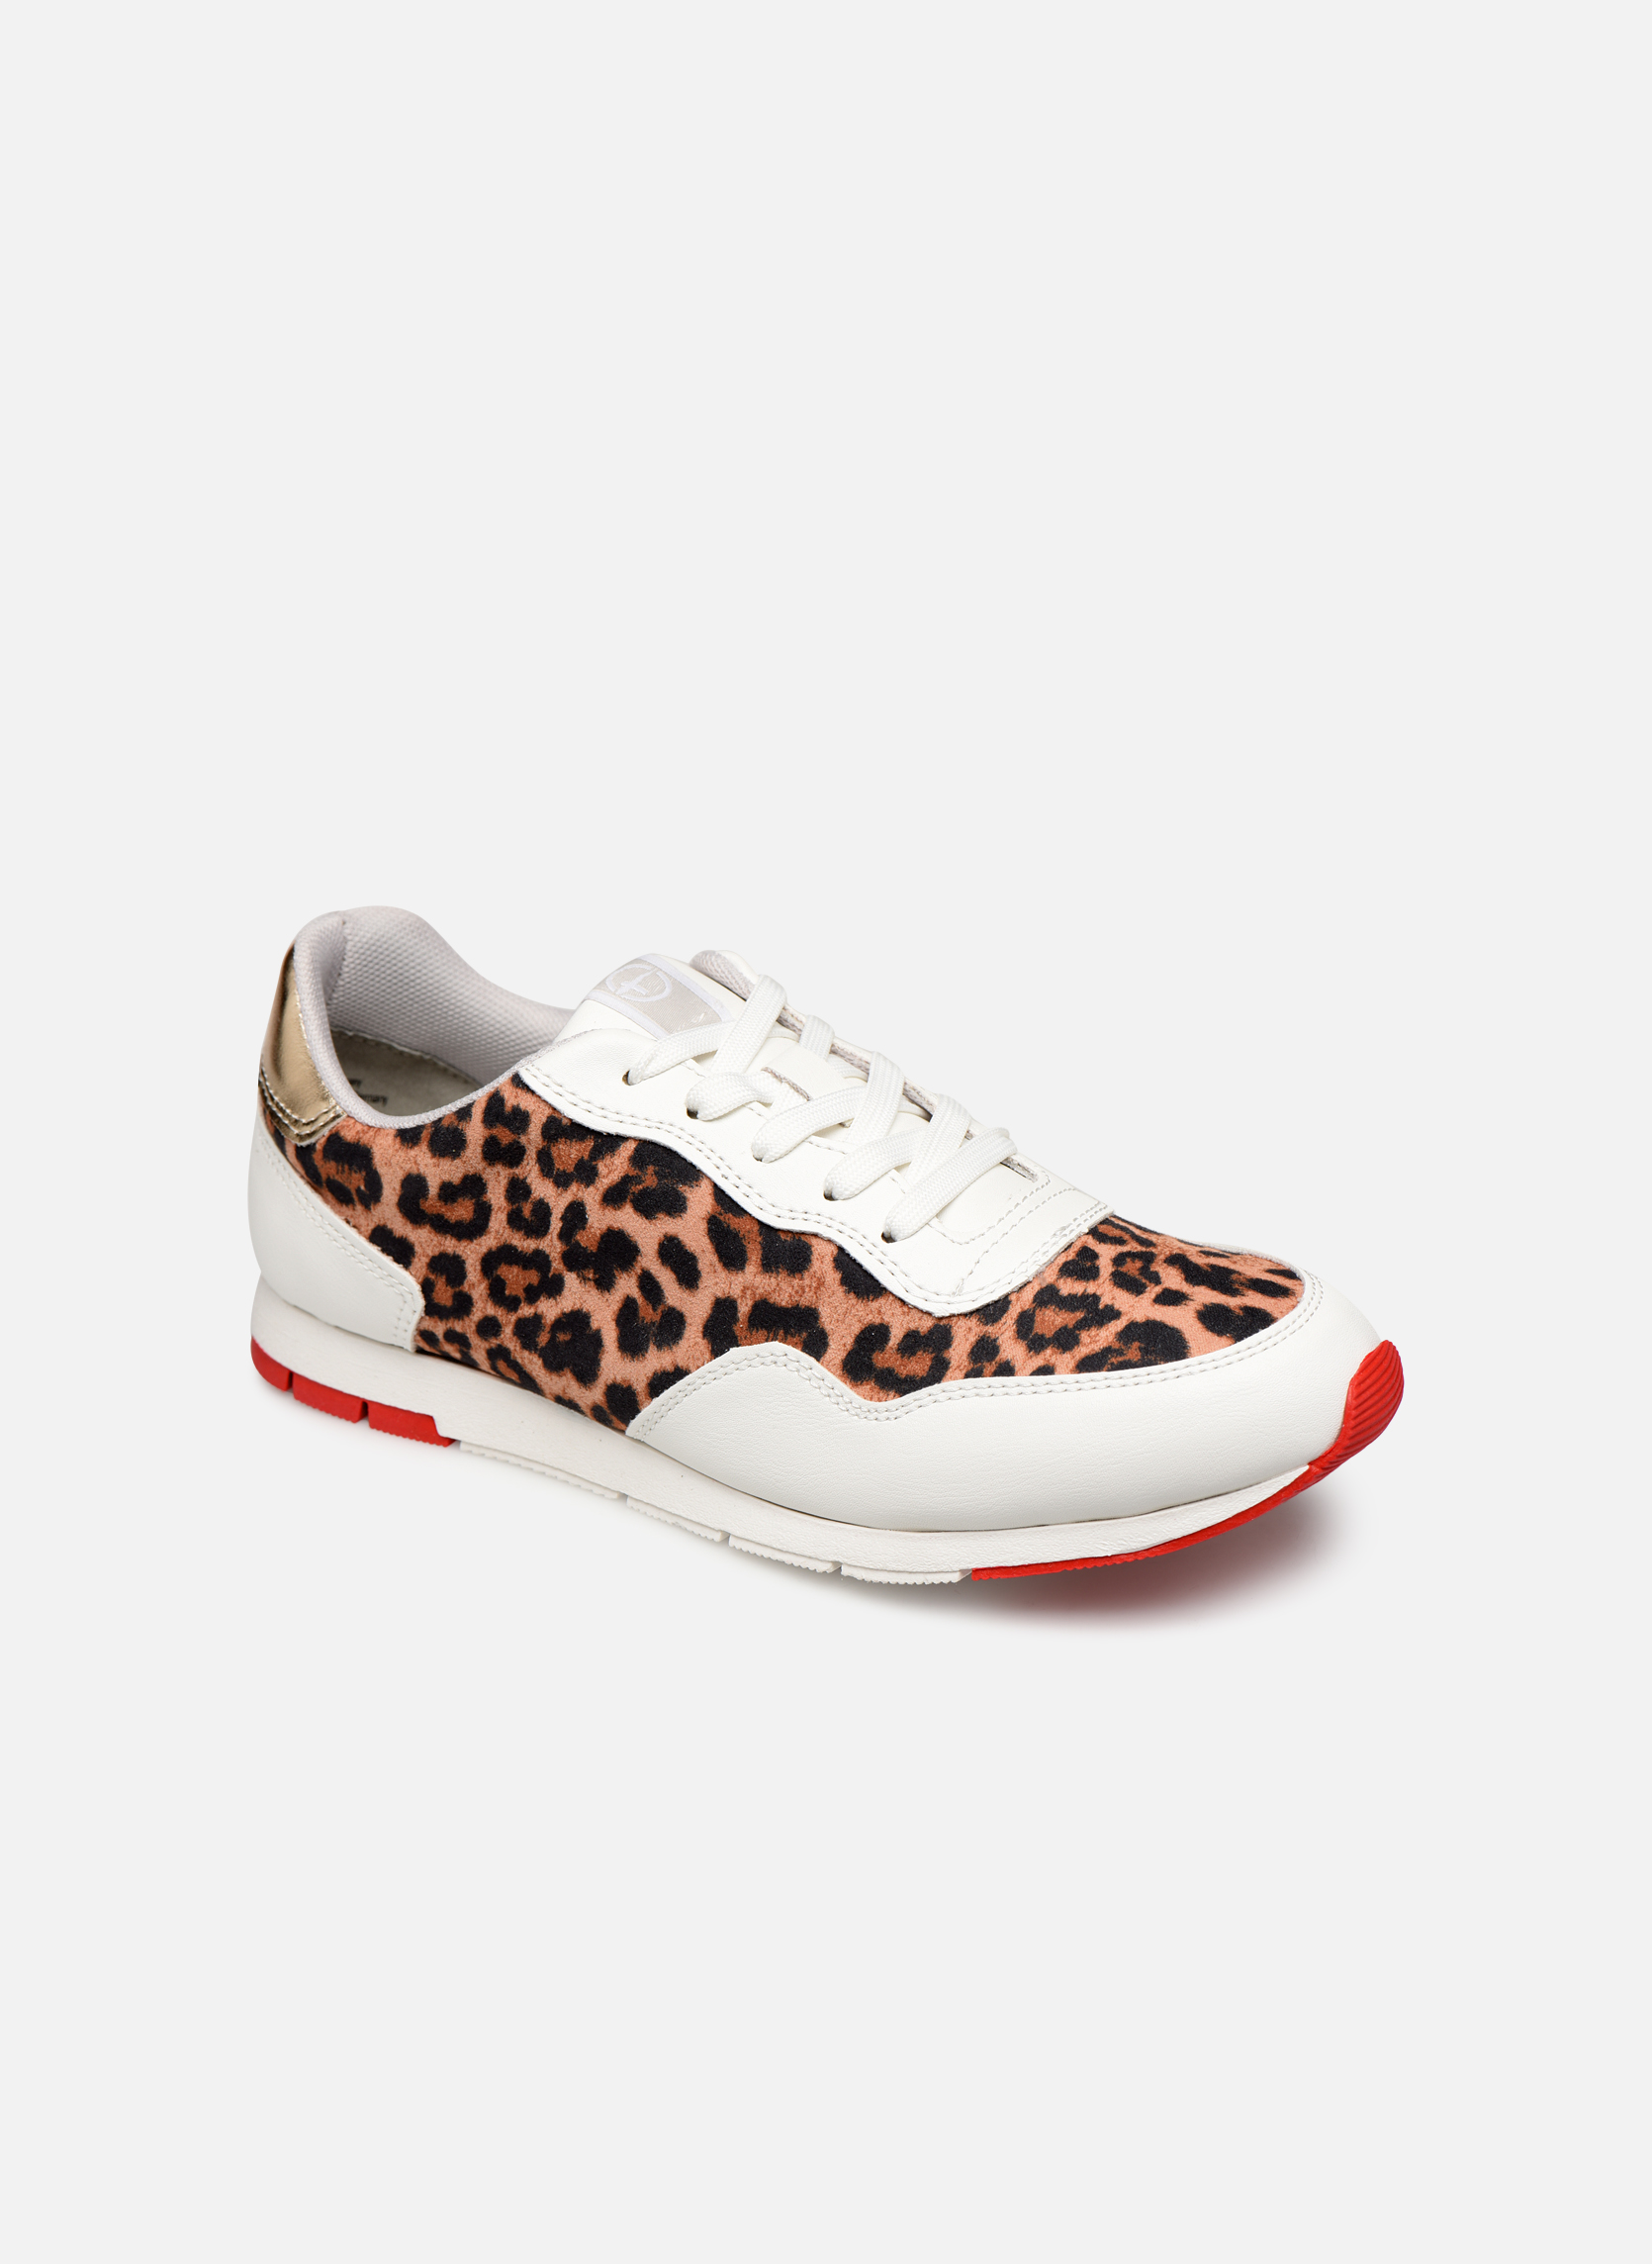 b2794fde355 Sneakers Salma by Tamaris - SchoenenTamTam.nl